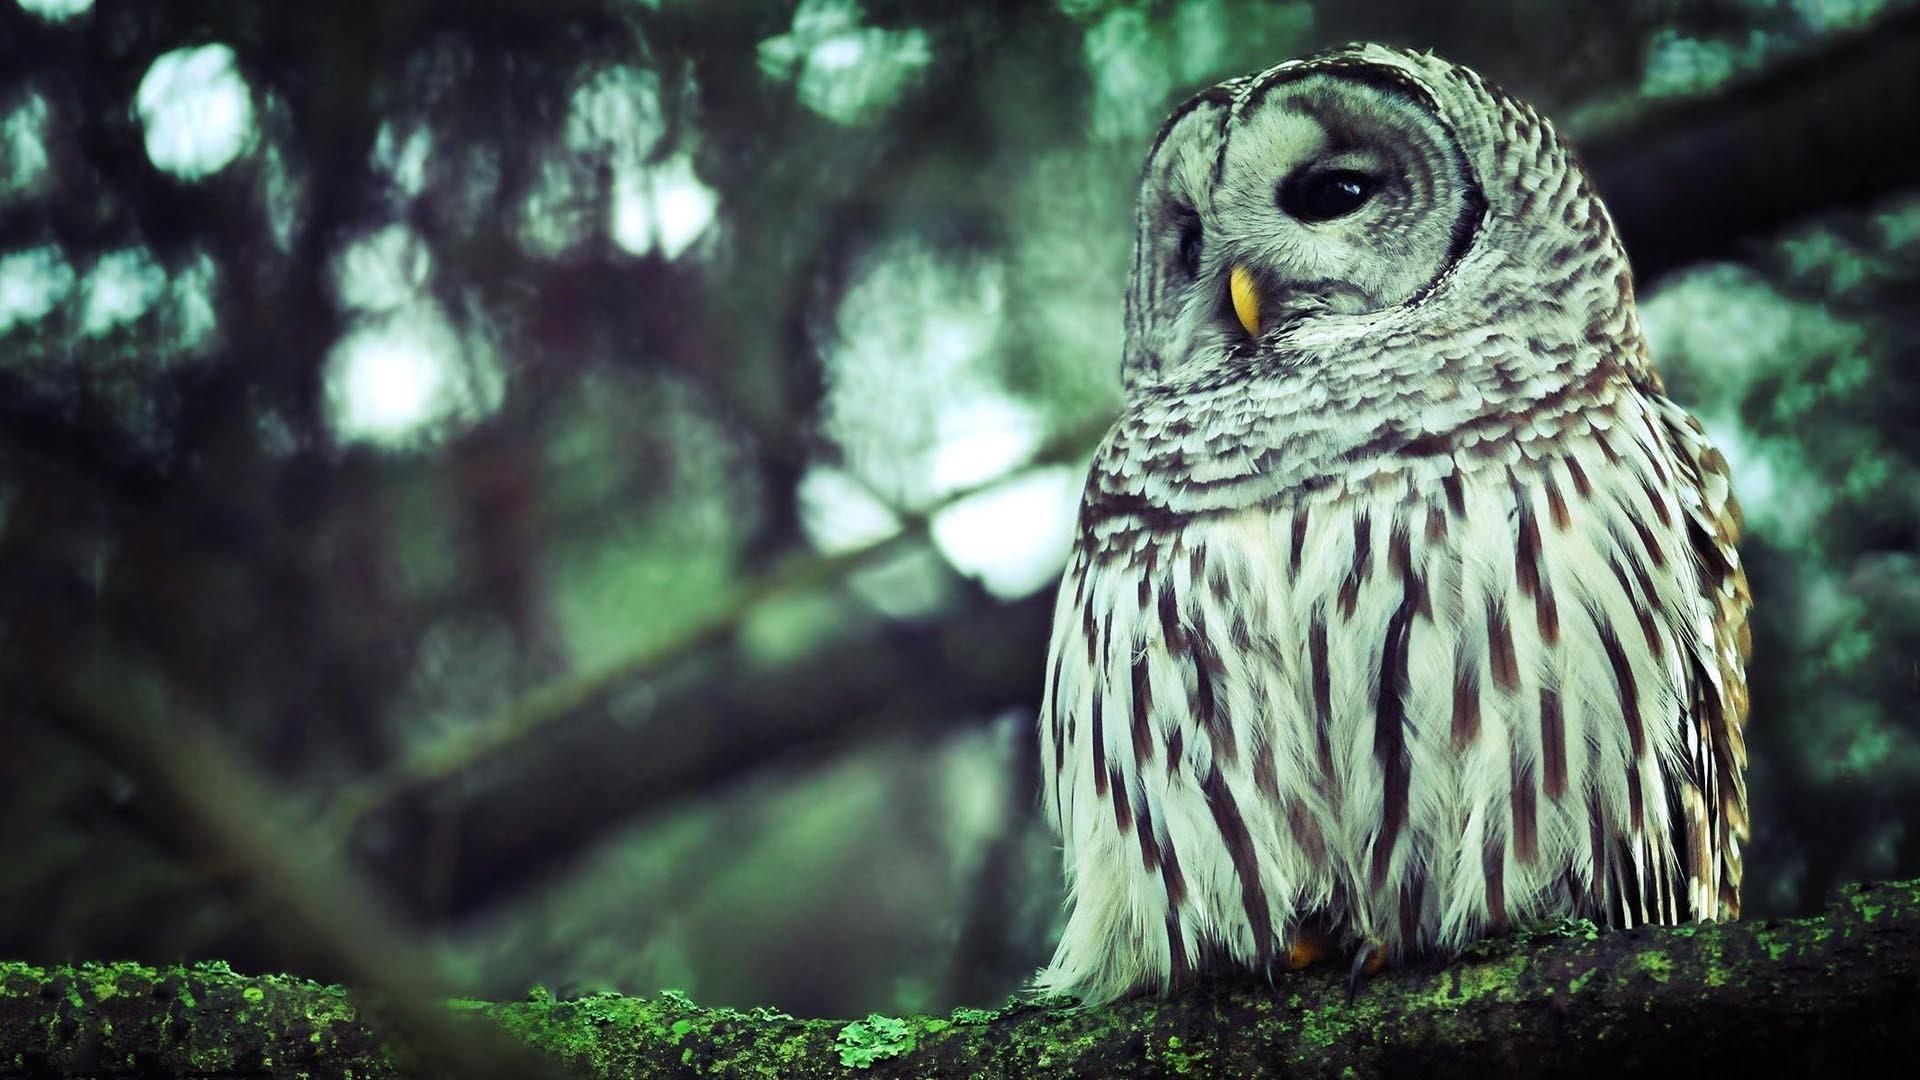 Hd Owl Wallpaper 78 Images